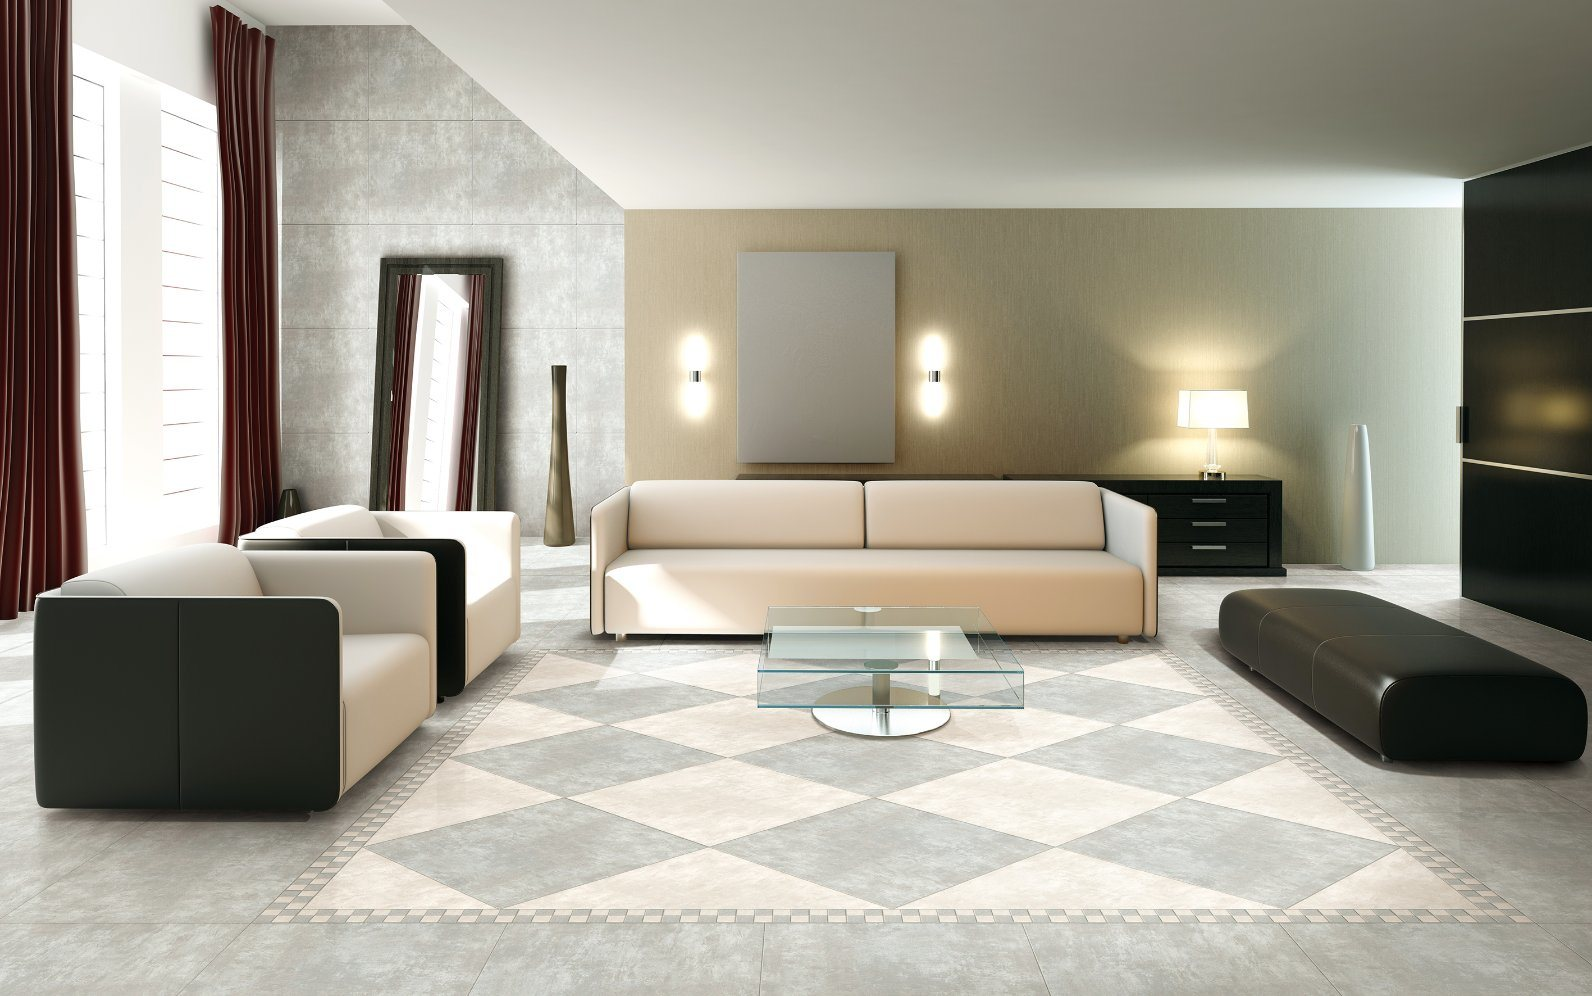 Gaogesi Series-Cement Design/Hot Sales Matte Finished/Rustic Tile Antique Brick Porcelain Floor Tile